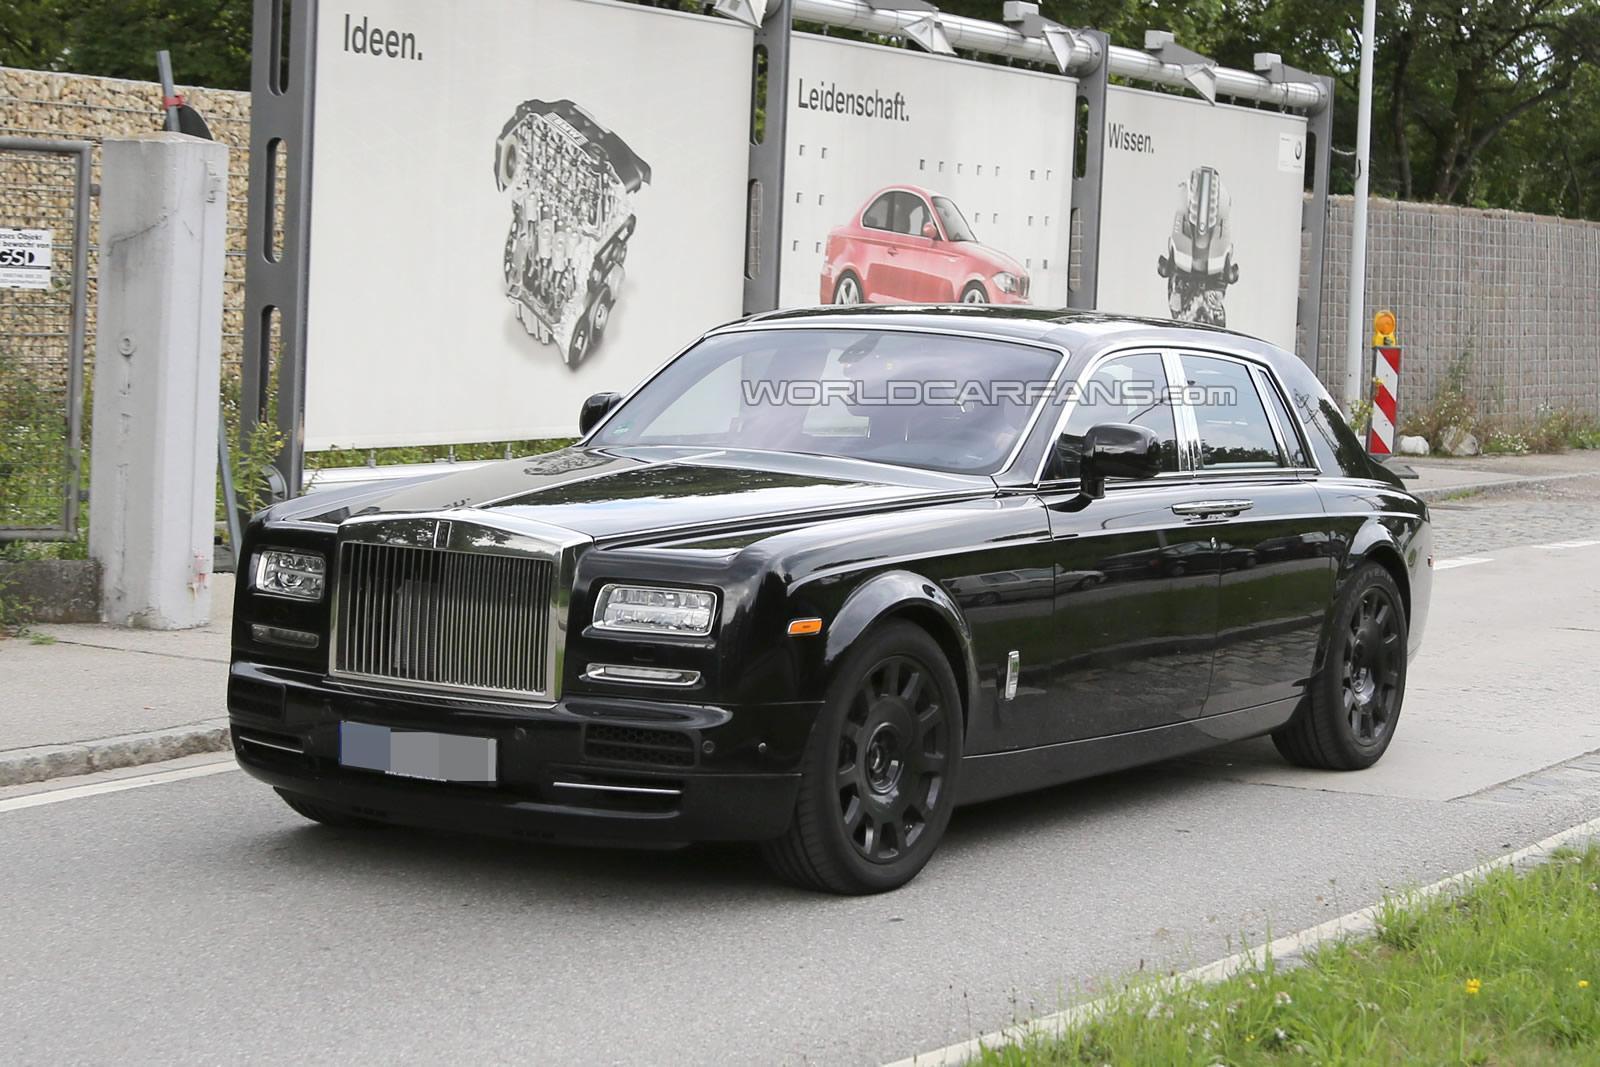 Next-Generation Rolls-Royce Phantom Spied Inside and Out - GTspirit